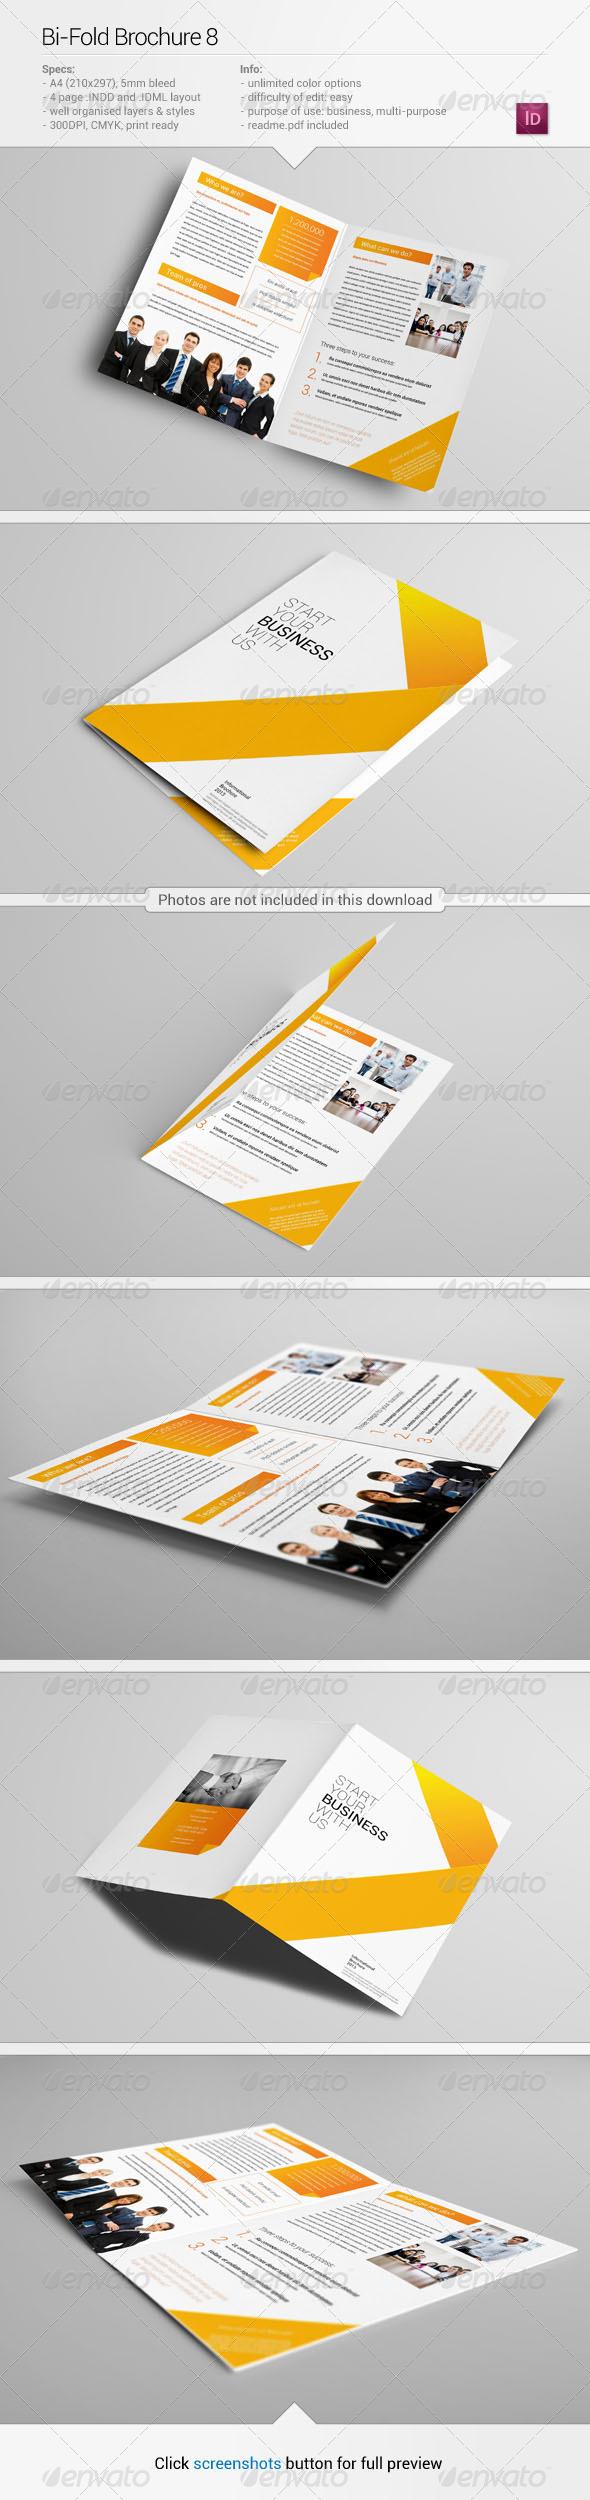 Bi-Fold Brochure 8 - Corporate Brochures